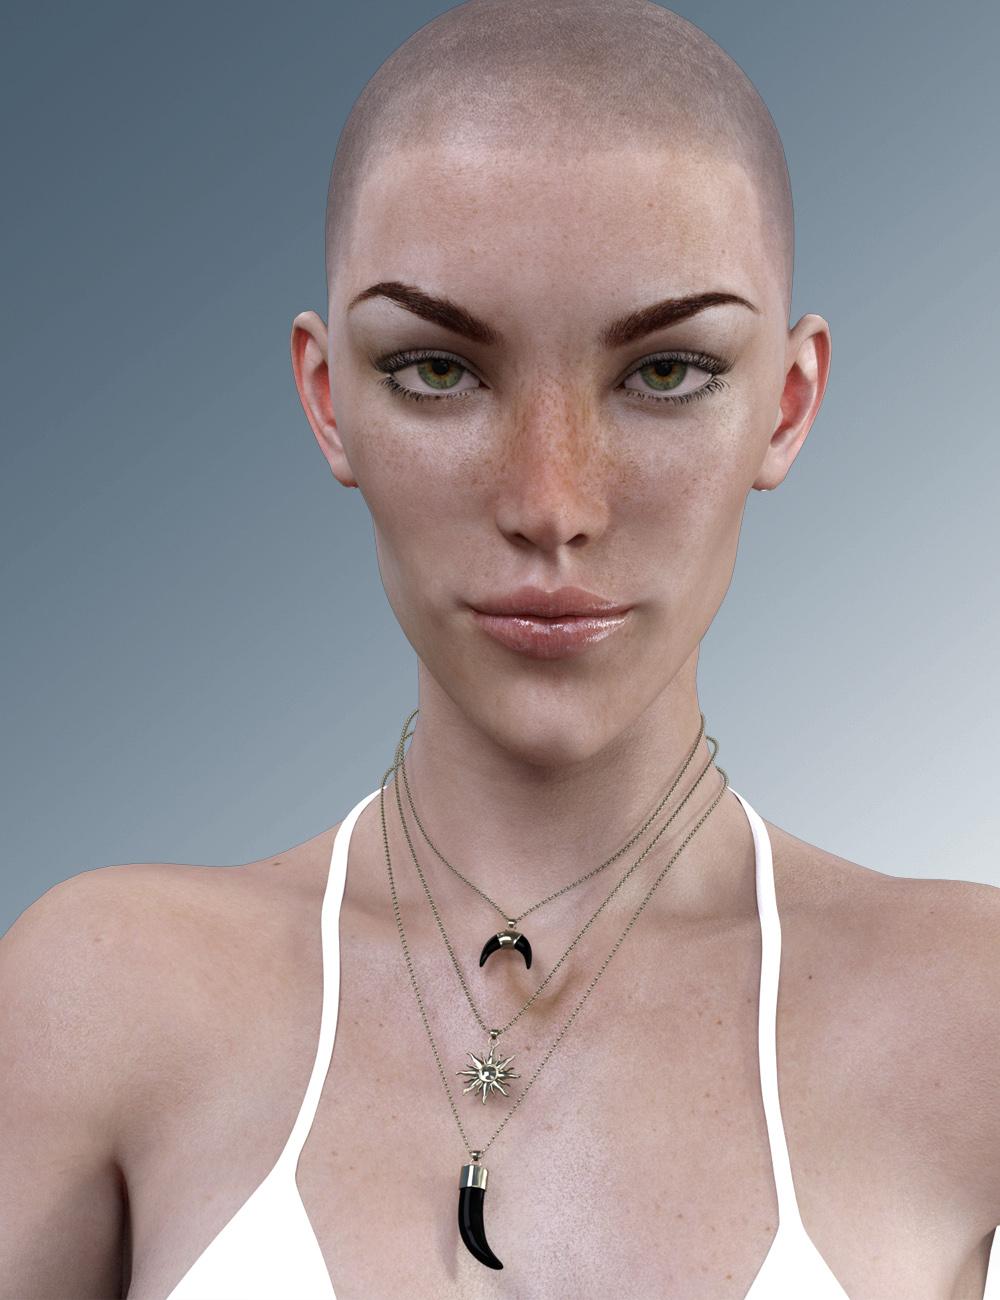 X-Leonore for Genesis 3 Female by: xtrart-3d, 3D Models by Daz 3D